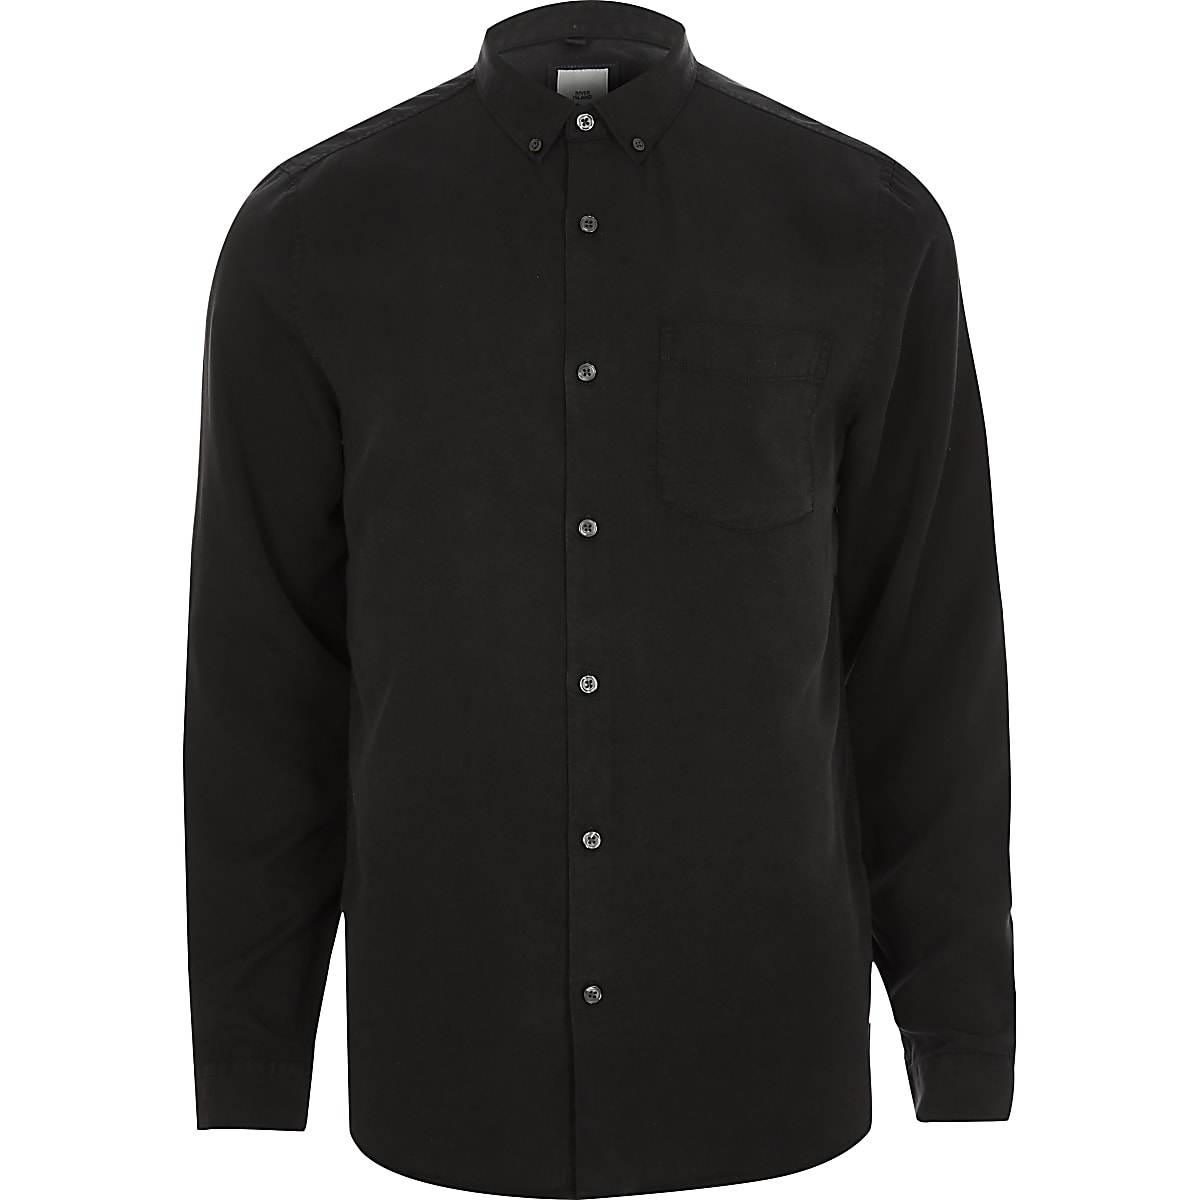 Black long sleeve button-down shirt